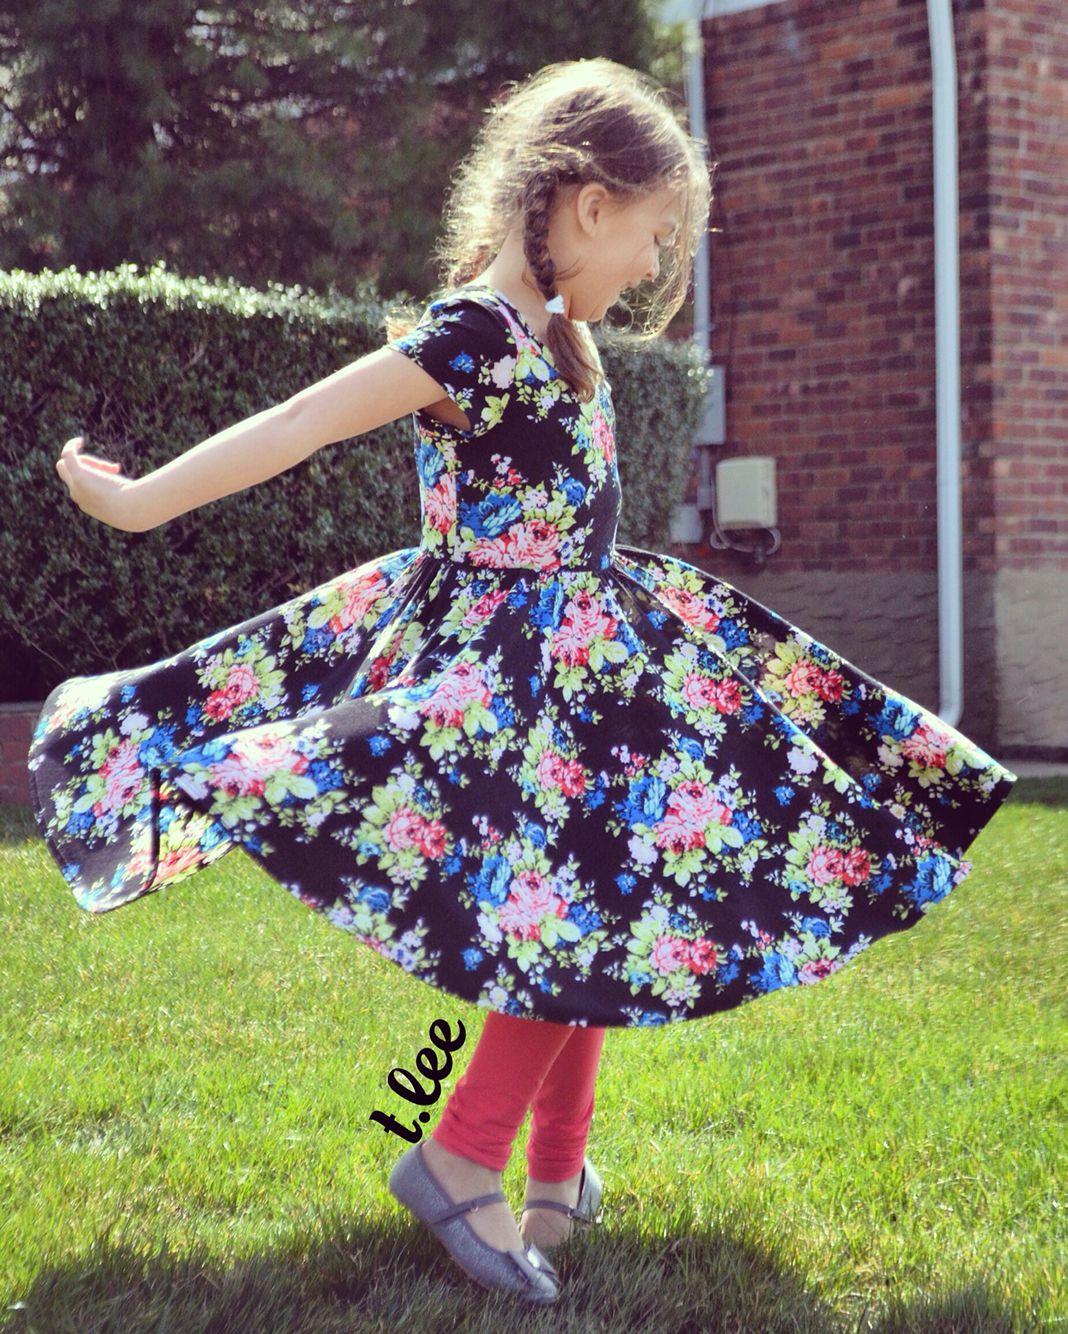 6a673441a15f LuLaRoe Dot Dot Smile Lucy Dress Shop for it here  https   www